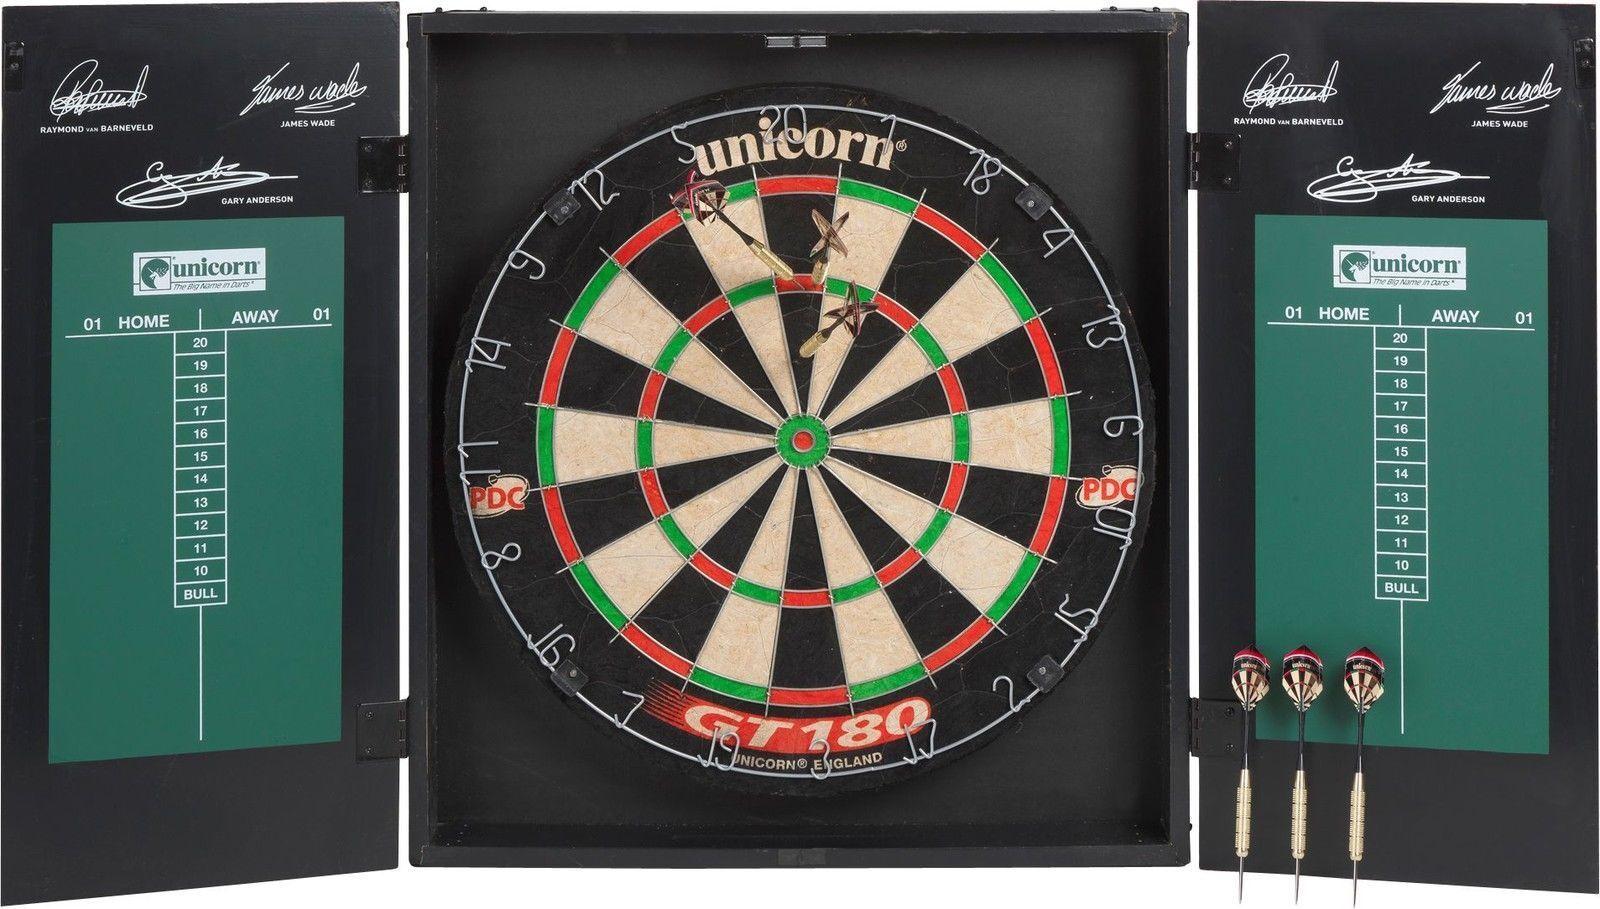 Original Unicorn Dartboard in Wooden Cabinet with Chalk Wiper & 2 Sets of Darts